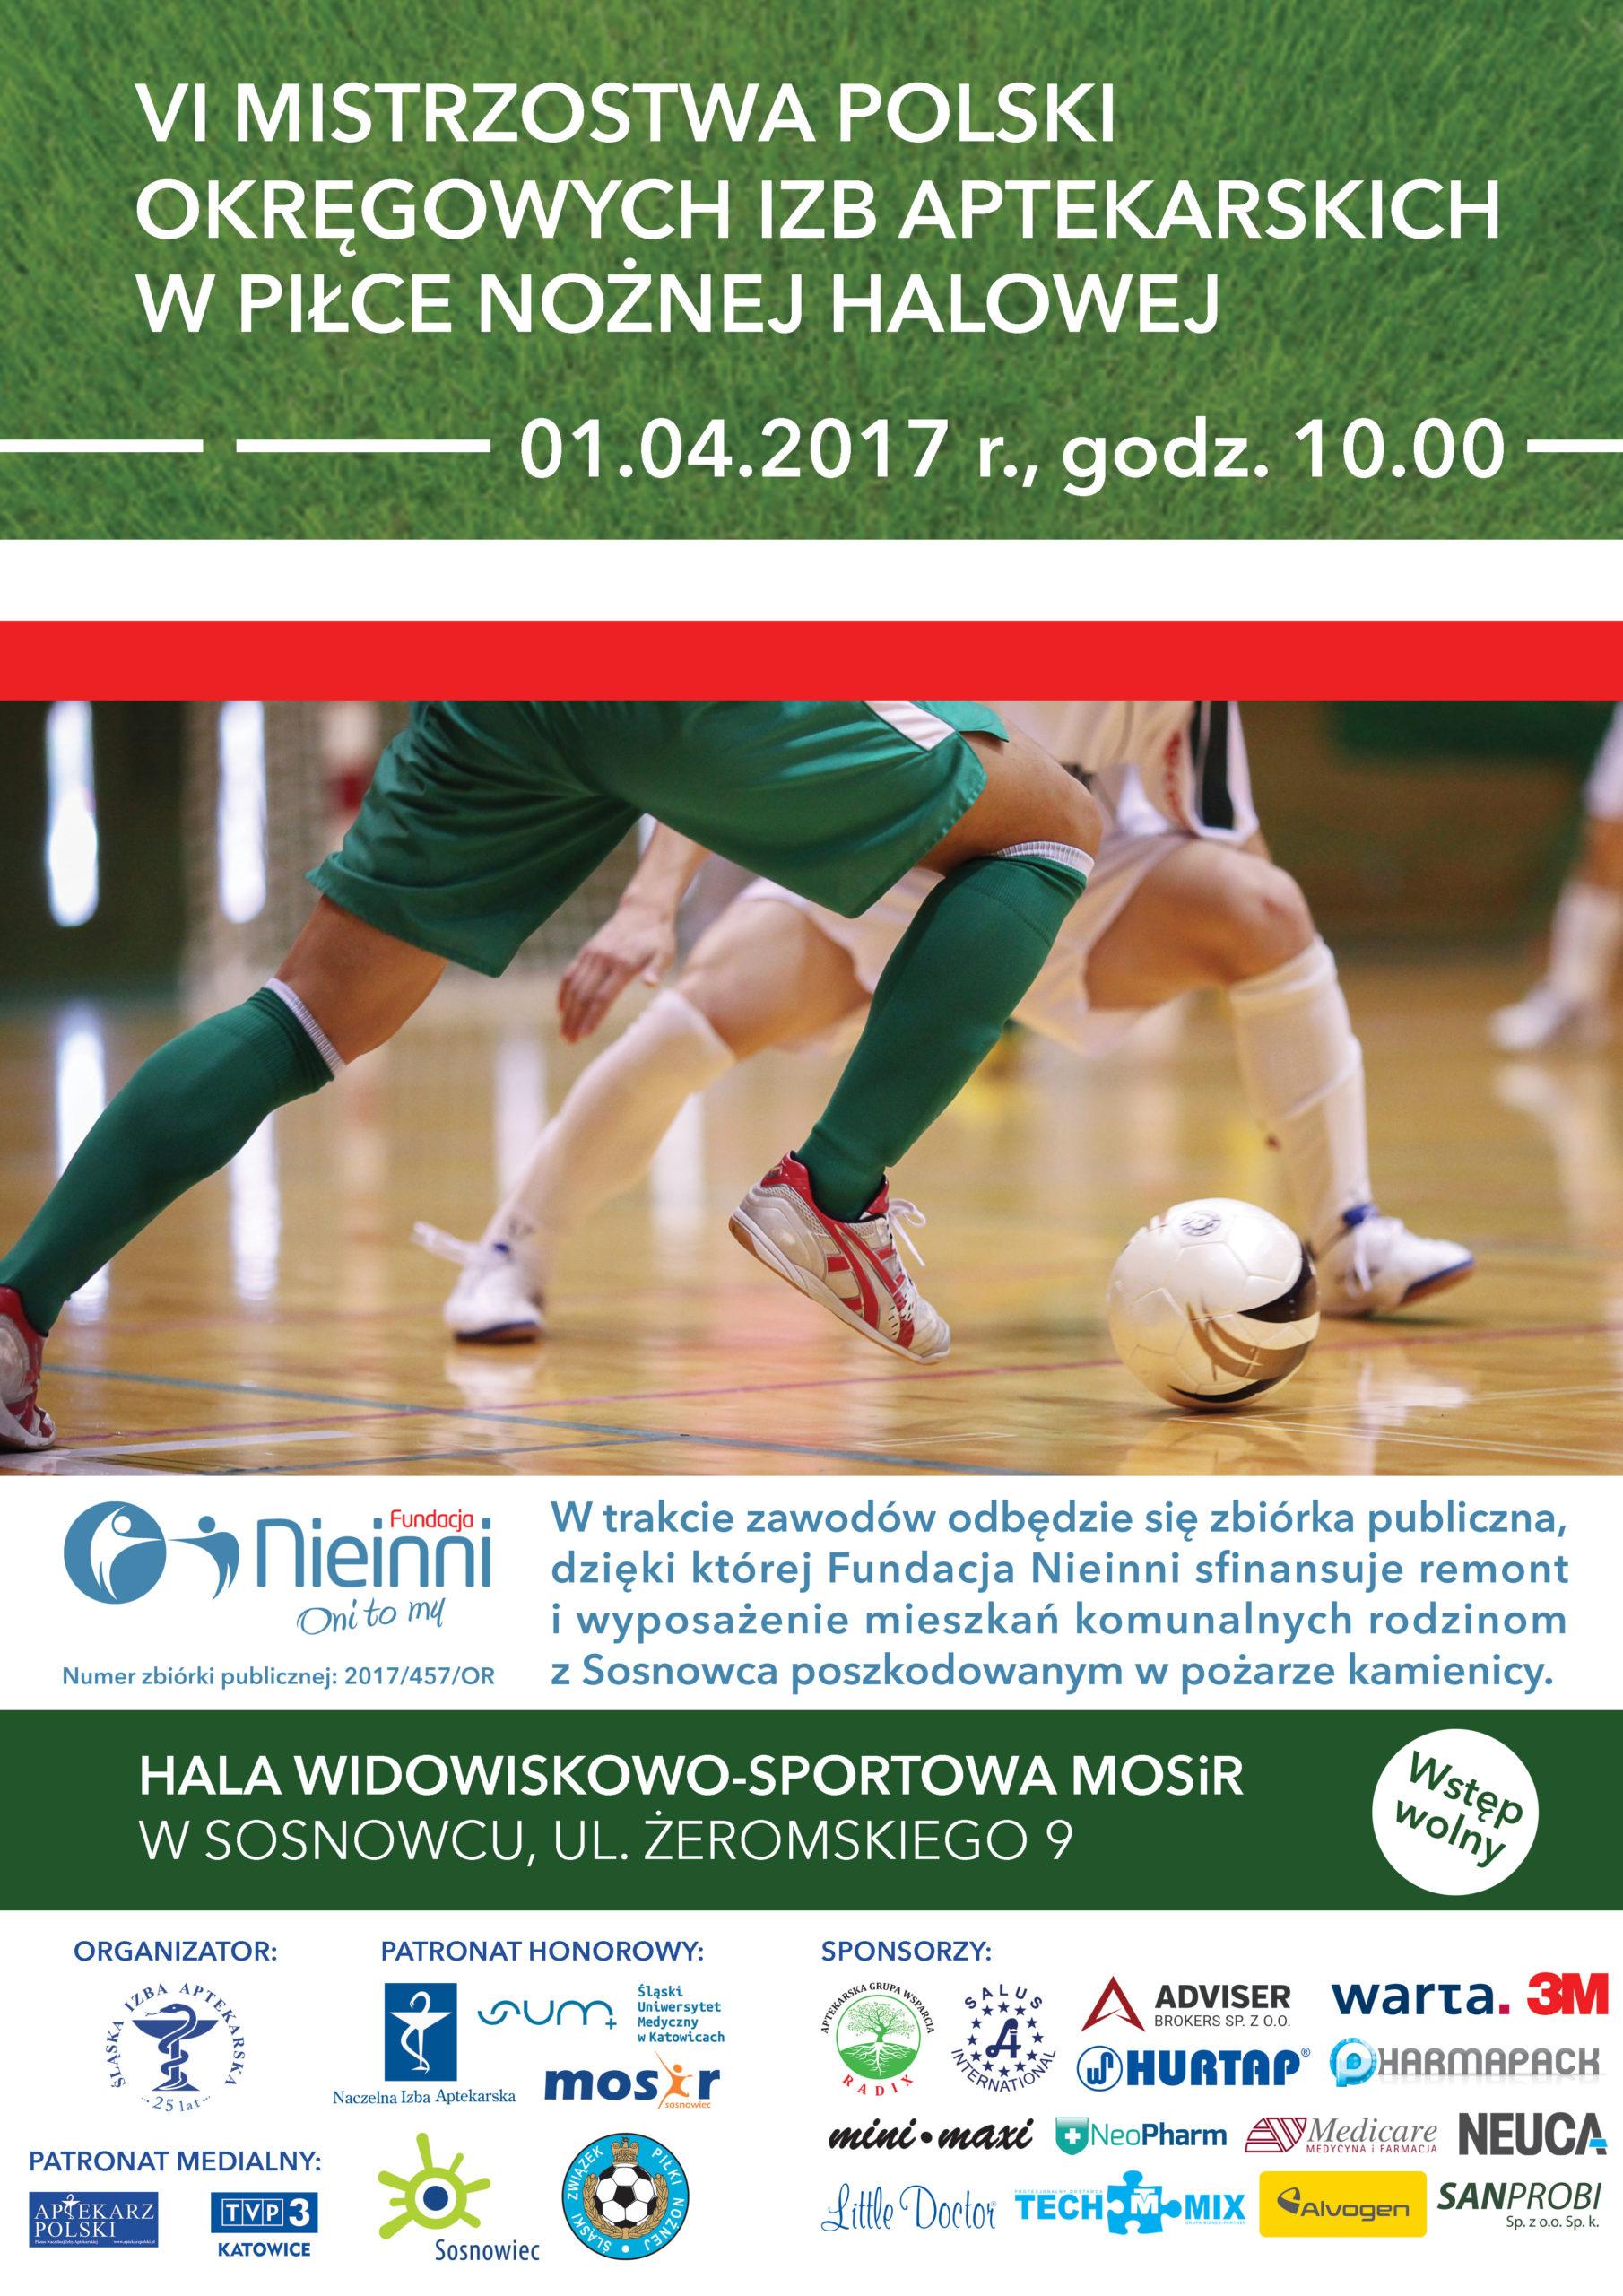 plakat VI Mistrzostwa Polski OIA Pilka Halowa 2017 04 01